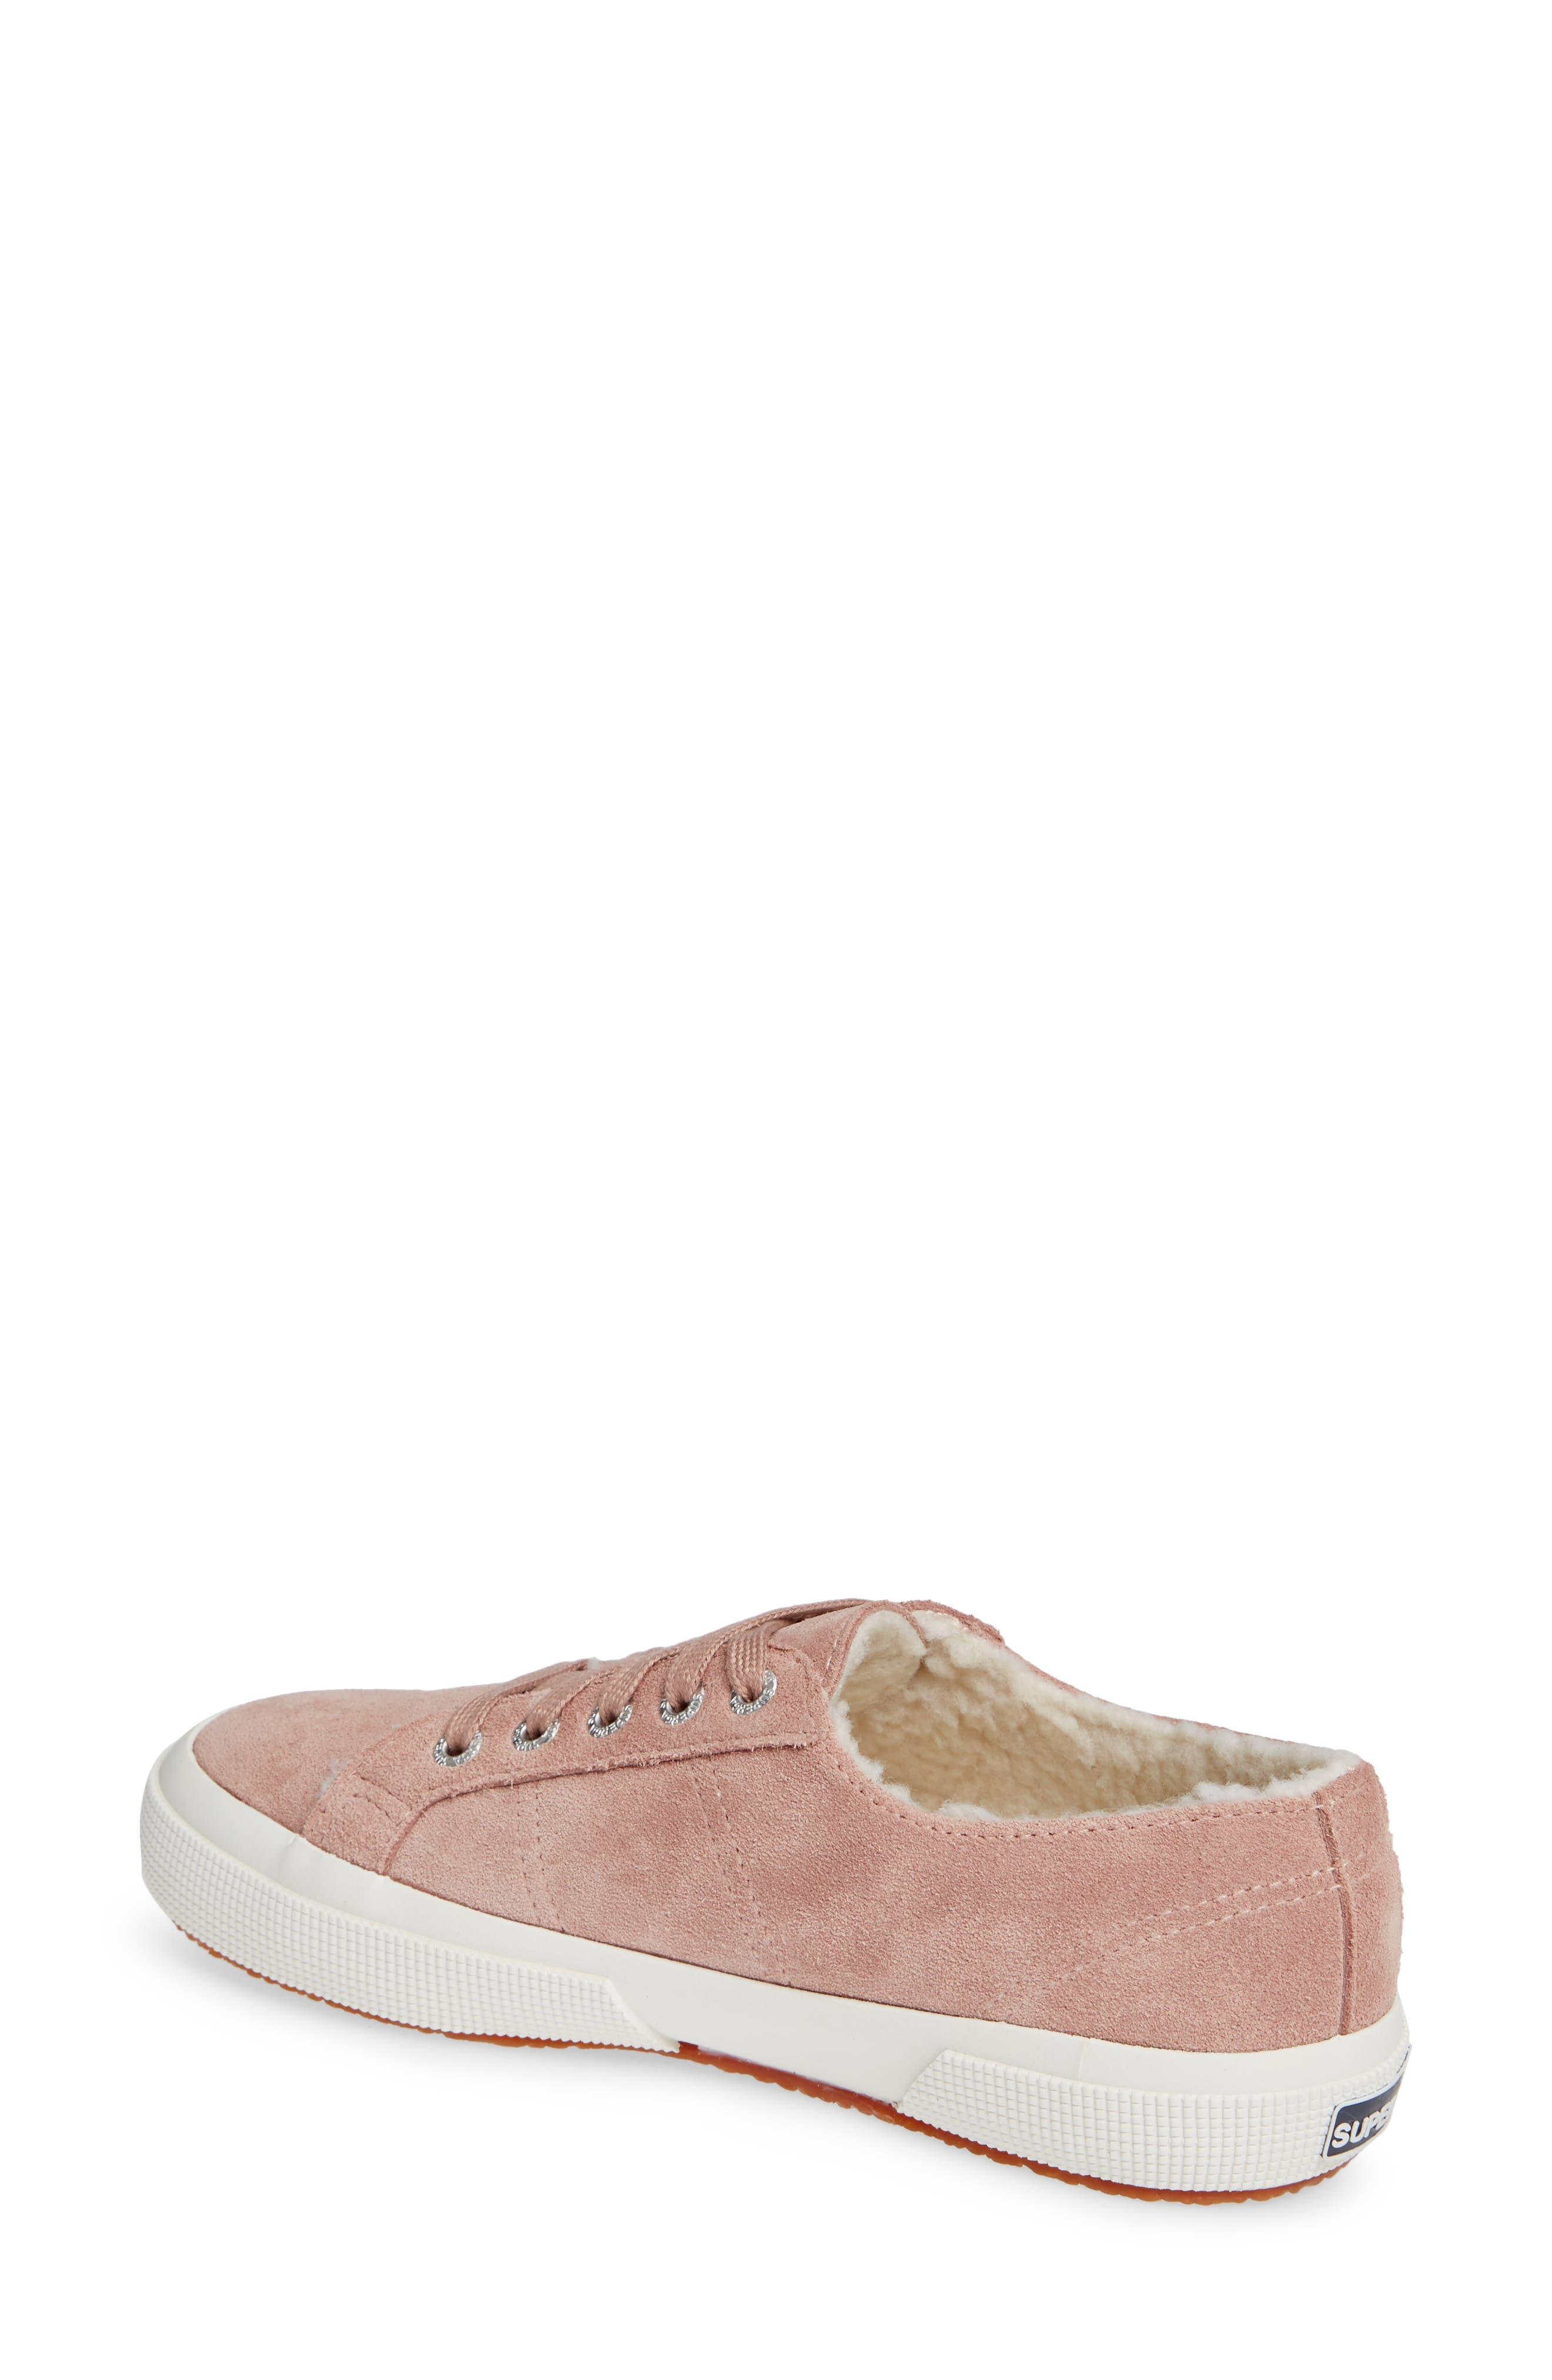 2750 Suefurw Sneaker,                             Alternate thumbnail 2, color,                             ROSE SUEDE